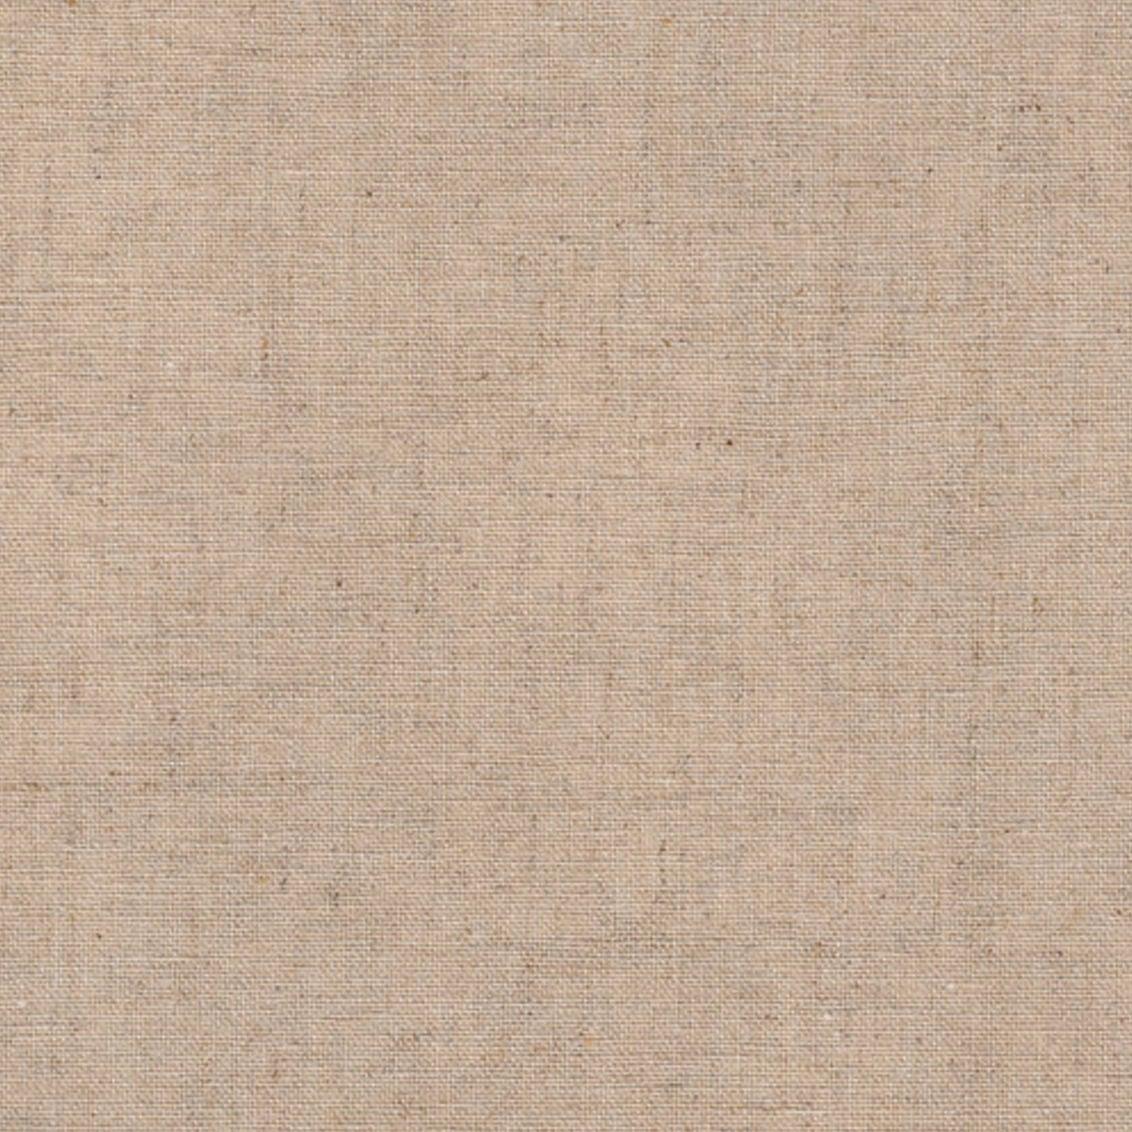 Premium Linen Blend in Soft Sand from the Denim Studio by Art Gallery Fabrics